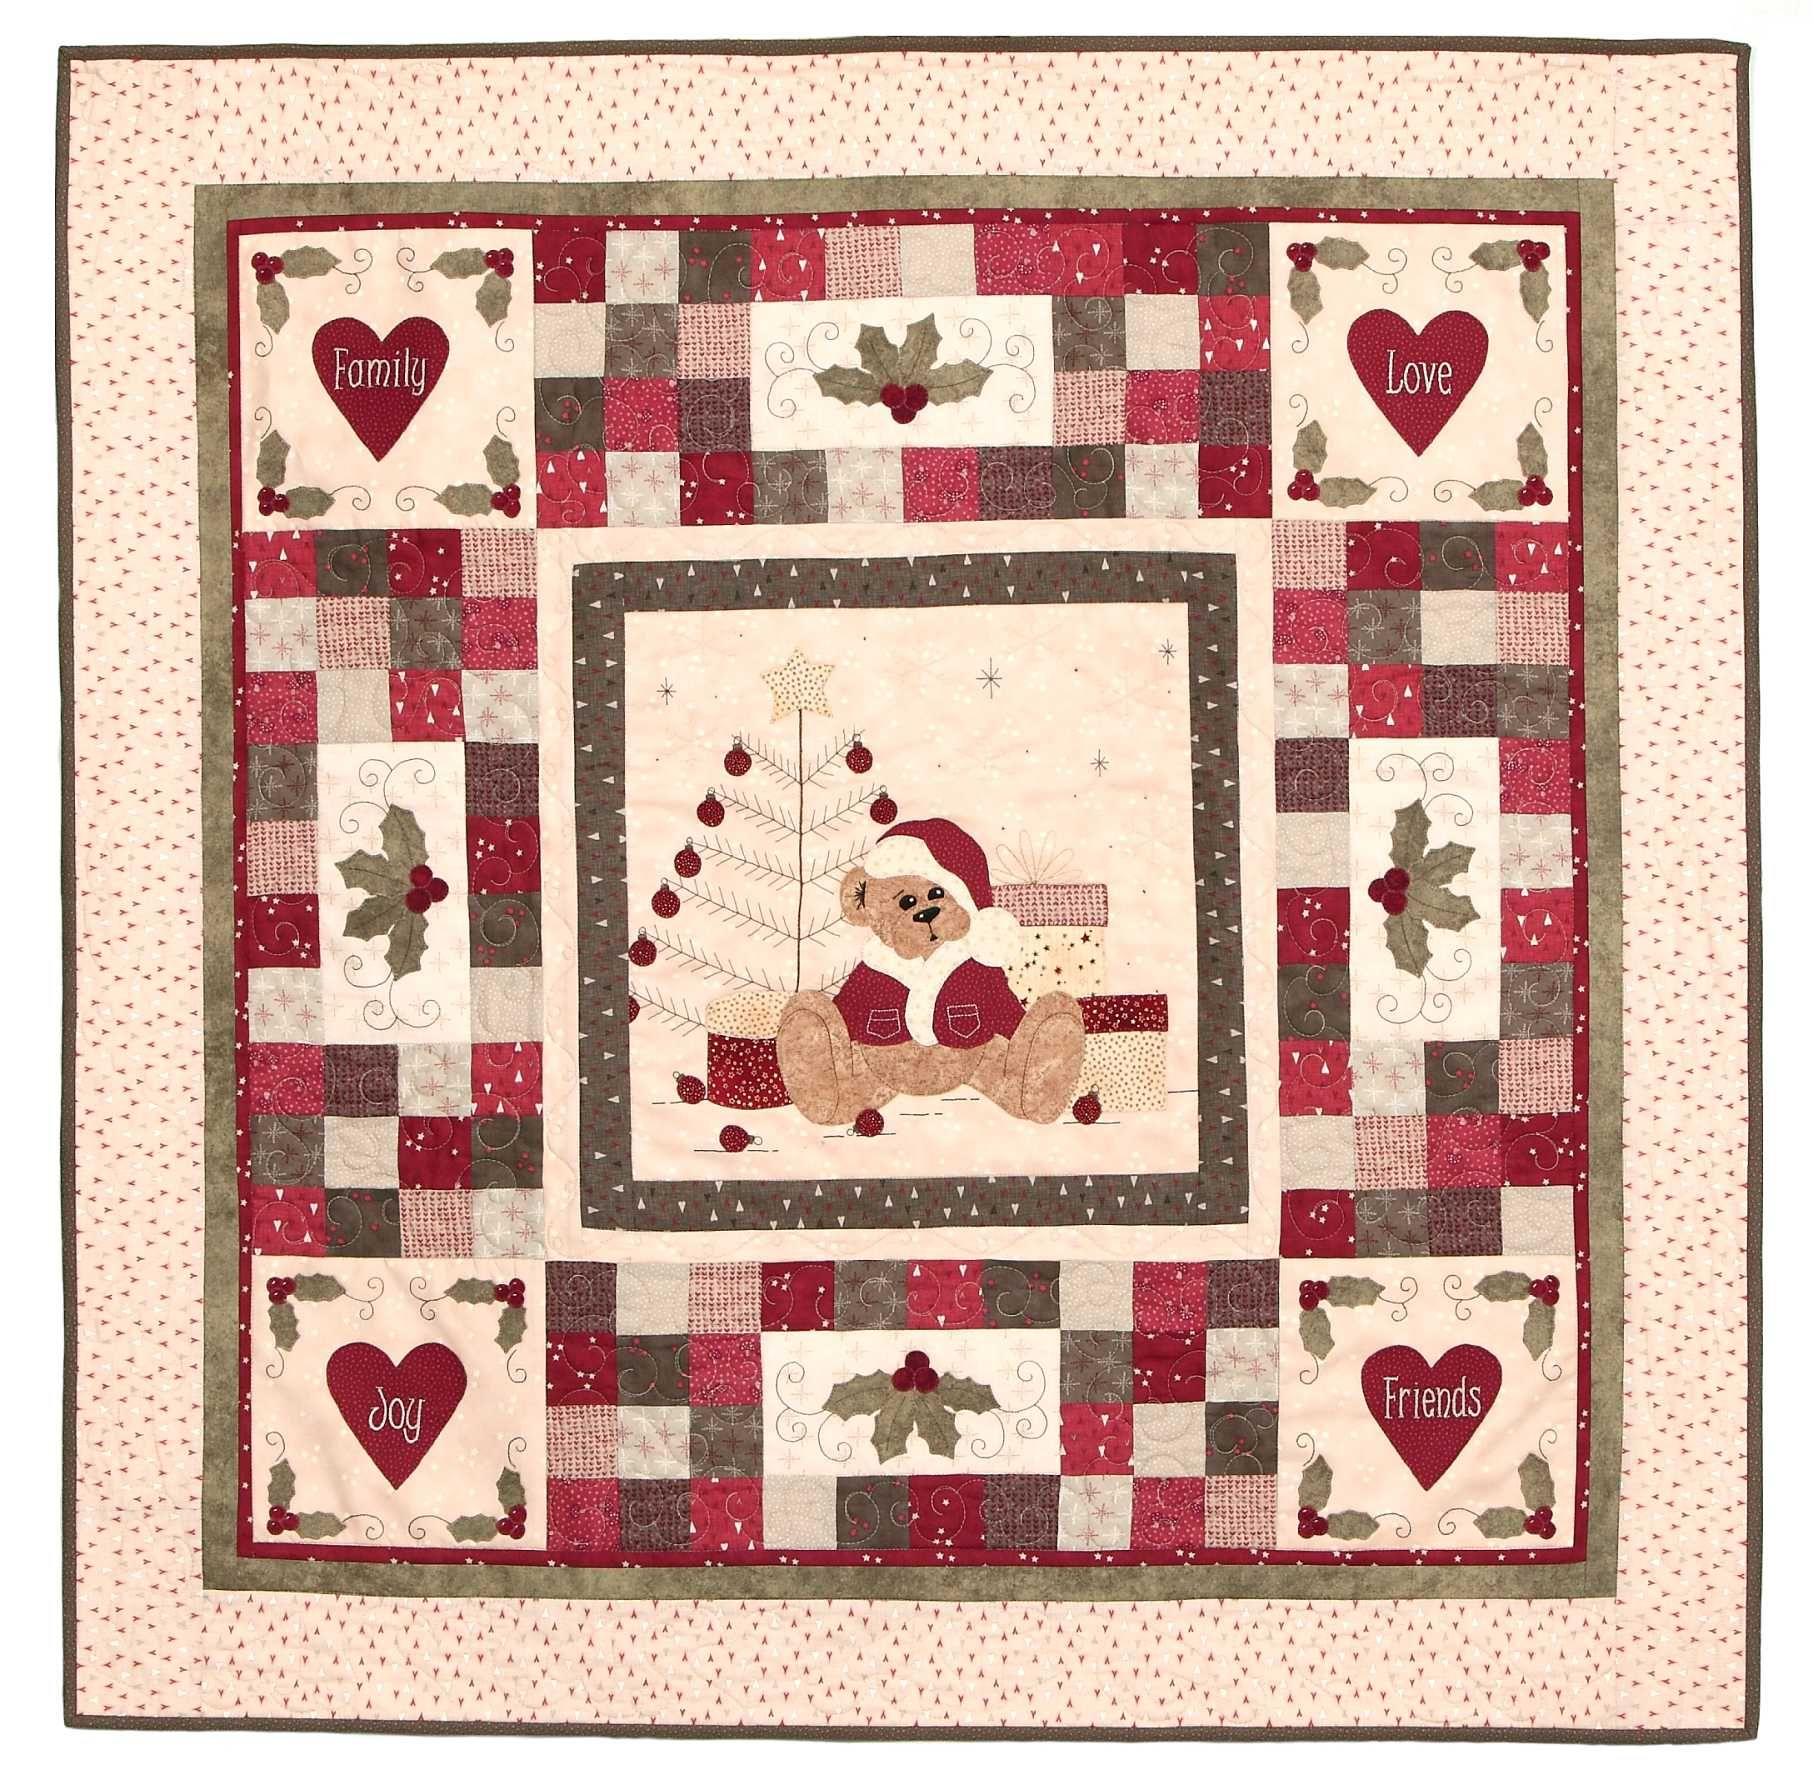 Teddy's first Christmas Quilt pattern | Artsmart Craft Cottage